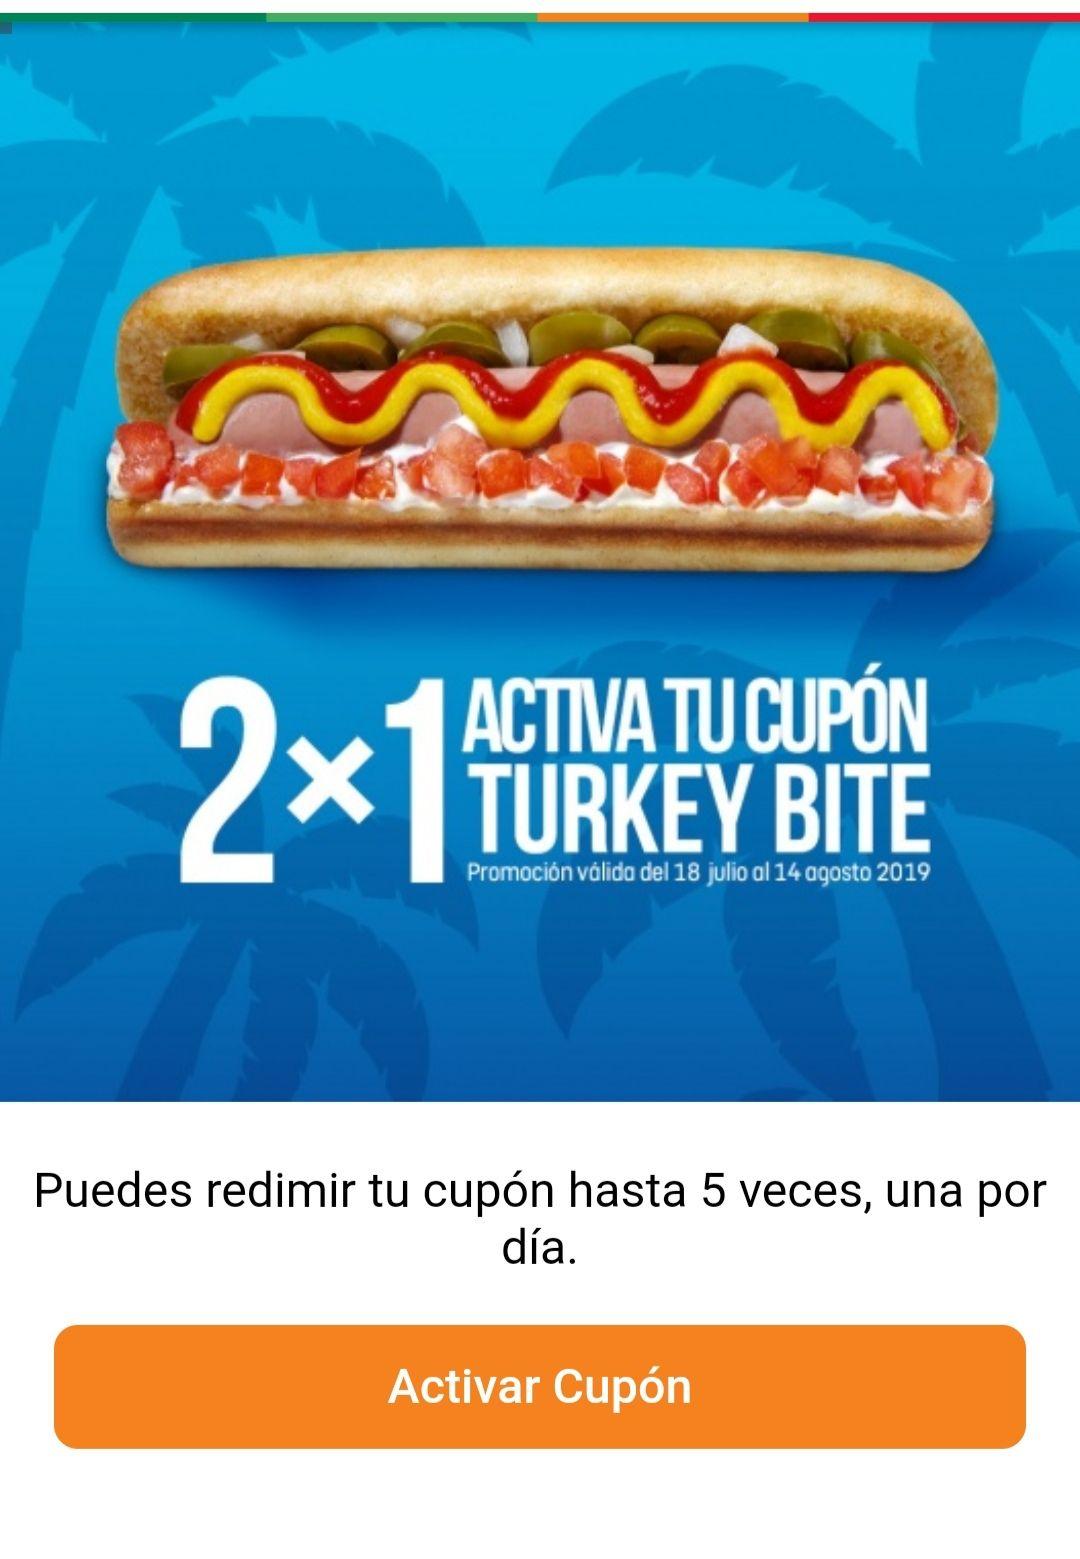 7 Eleven: 2x1 hotdog turkey bite